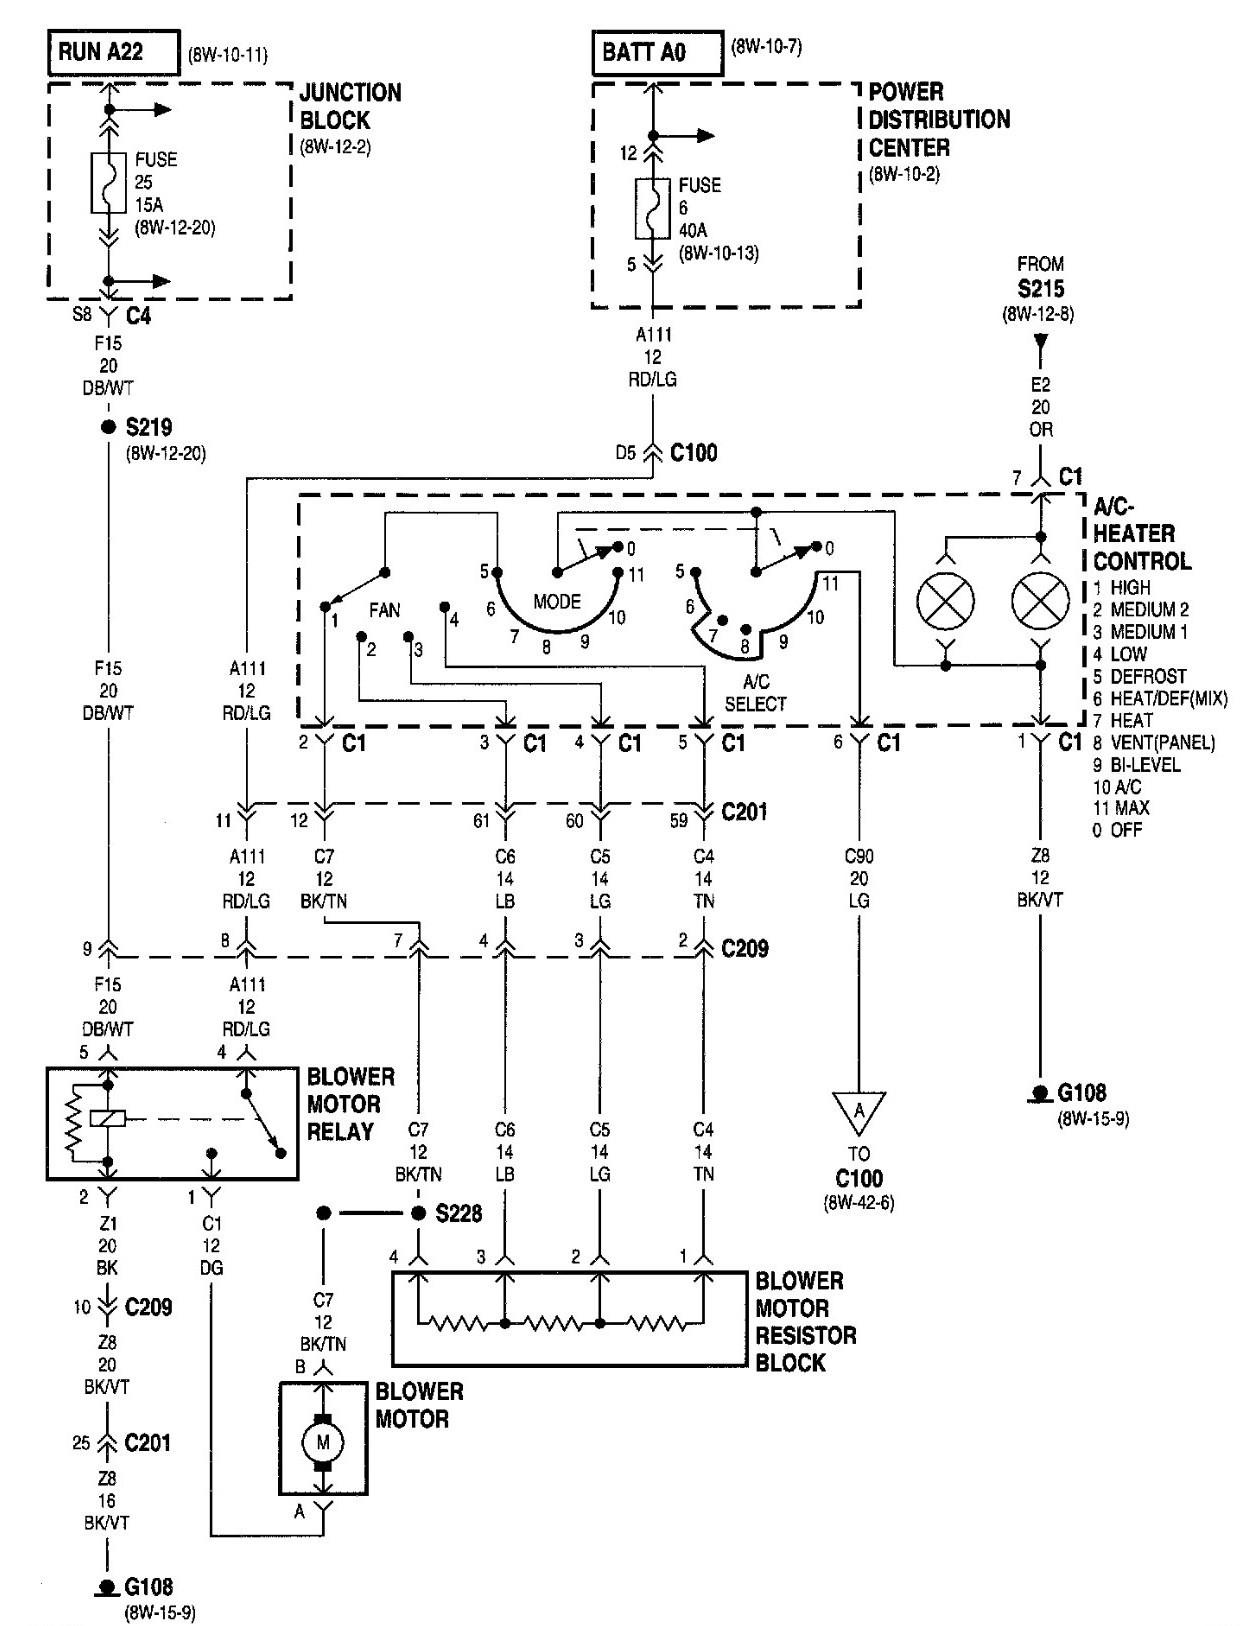 Jeep Wrangler Radio Wiring Diagram Chrysler Radio Wiring Diagrams Elegant 1997 Jeep Wrangler Radio Of Jeep Wrangler Radio Wiring Diagram